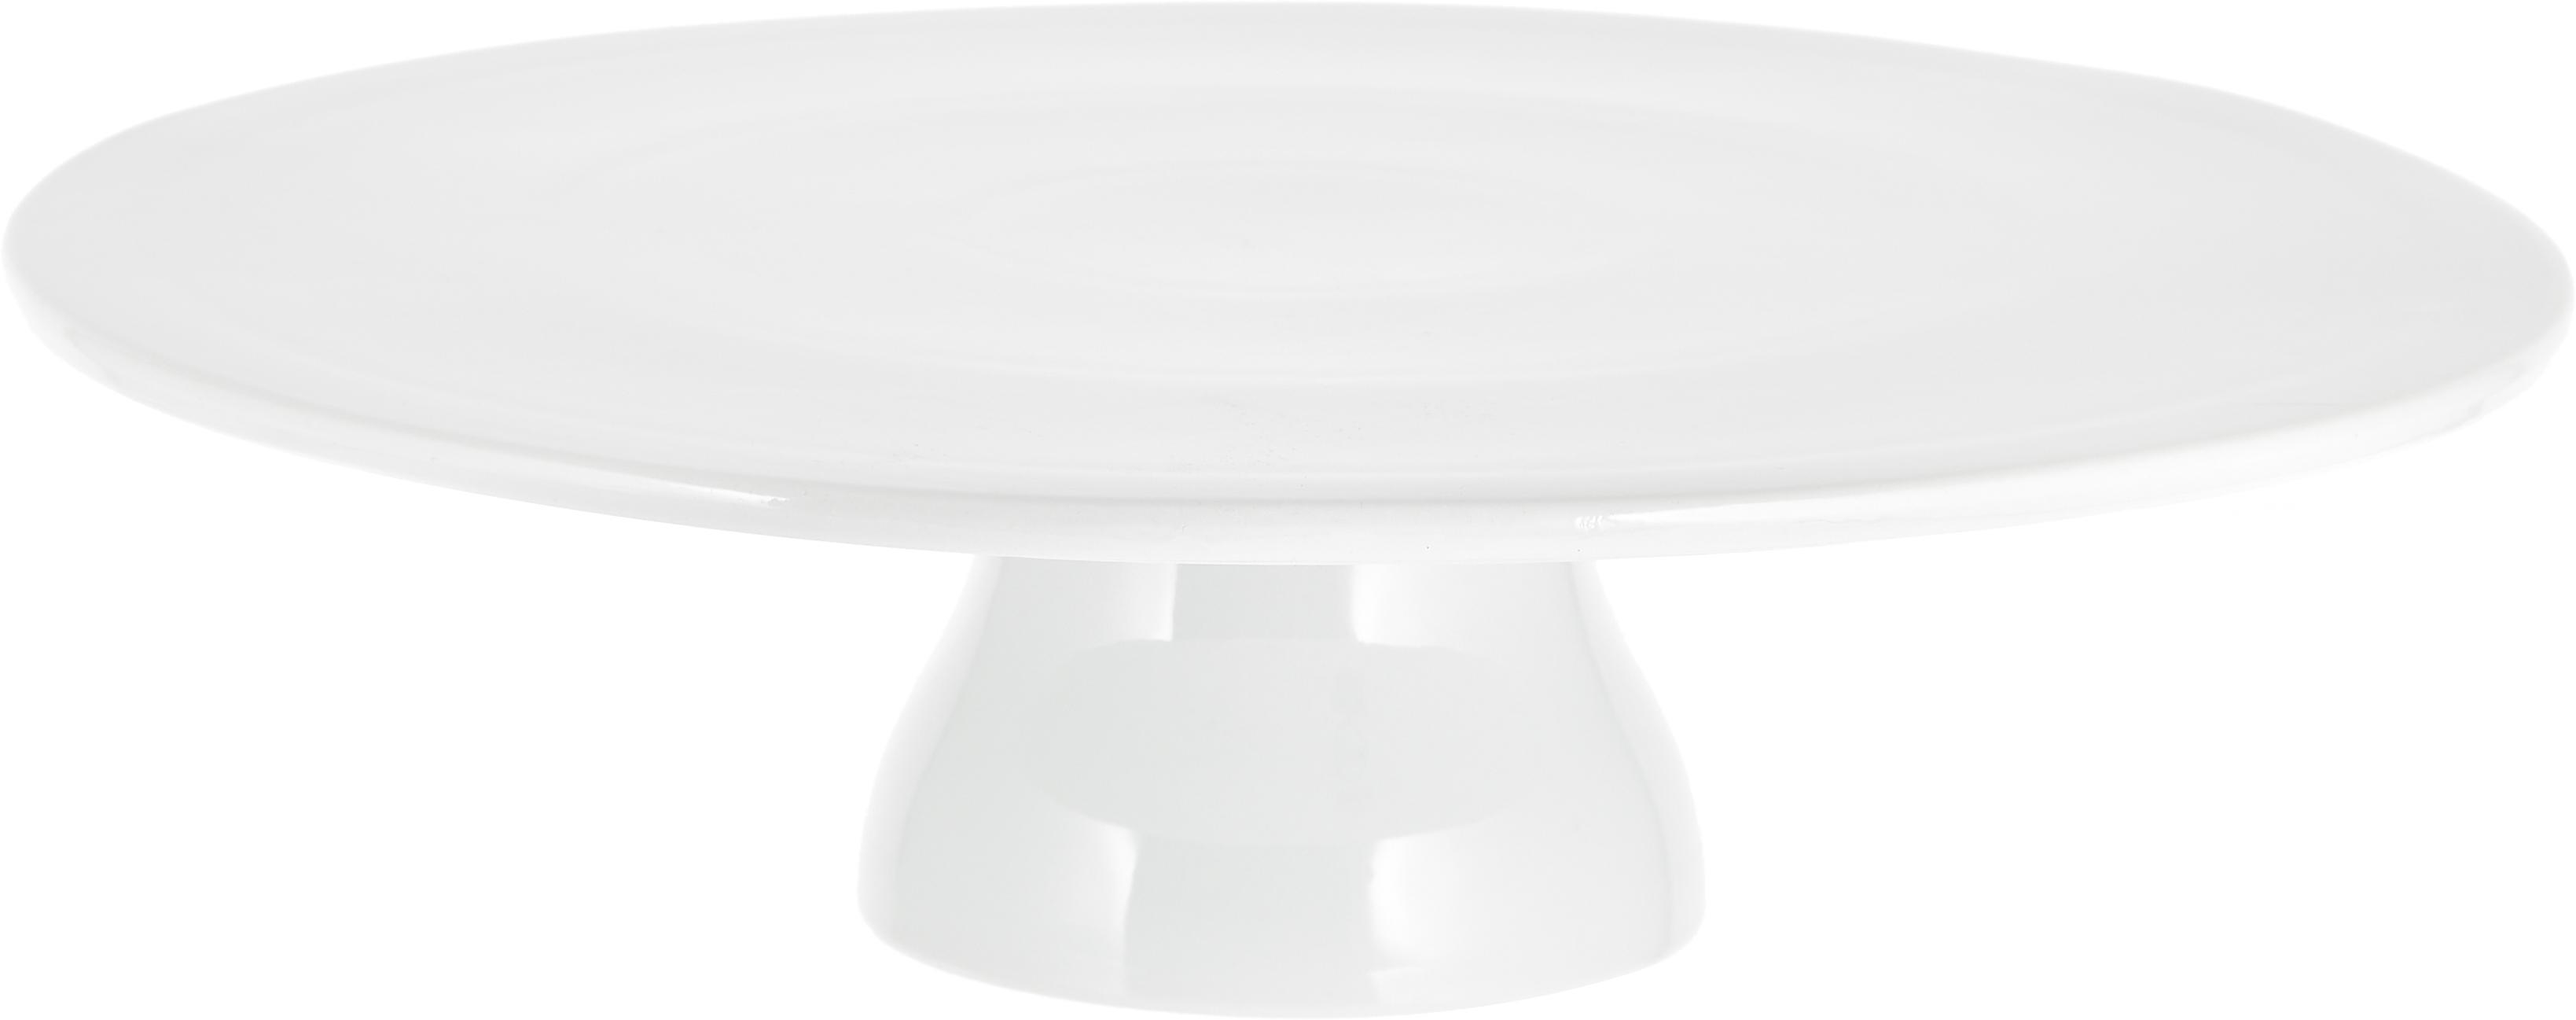 Tortenplatte Yanis, Porzellan, Weiss, Ø 33 cm